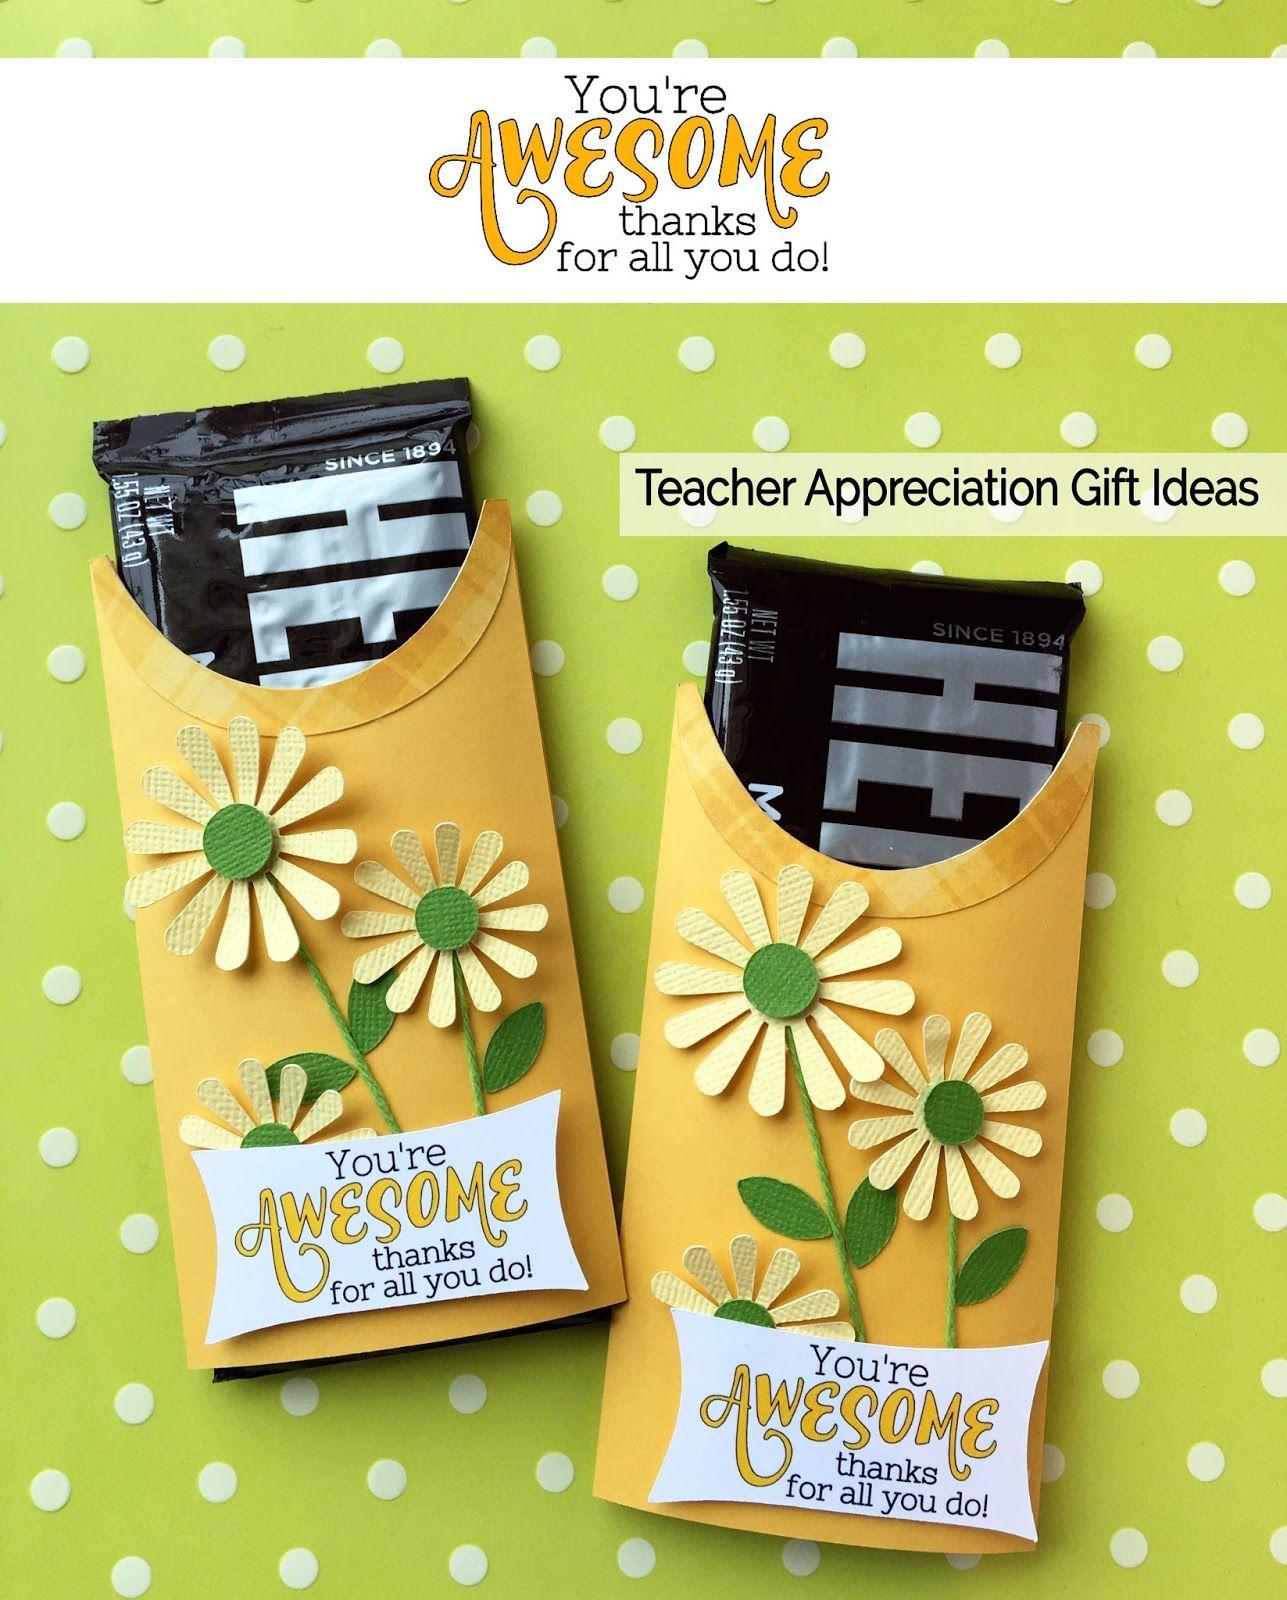 Ideas for Teacher Appreciation gifts | Cards & Paper | Pinterest ...